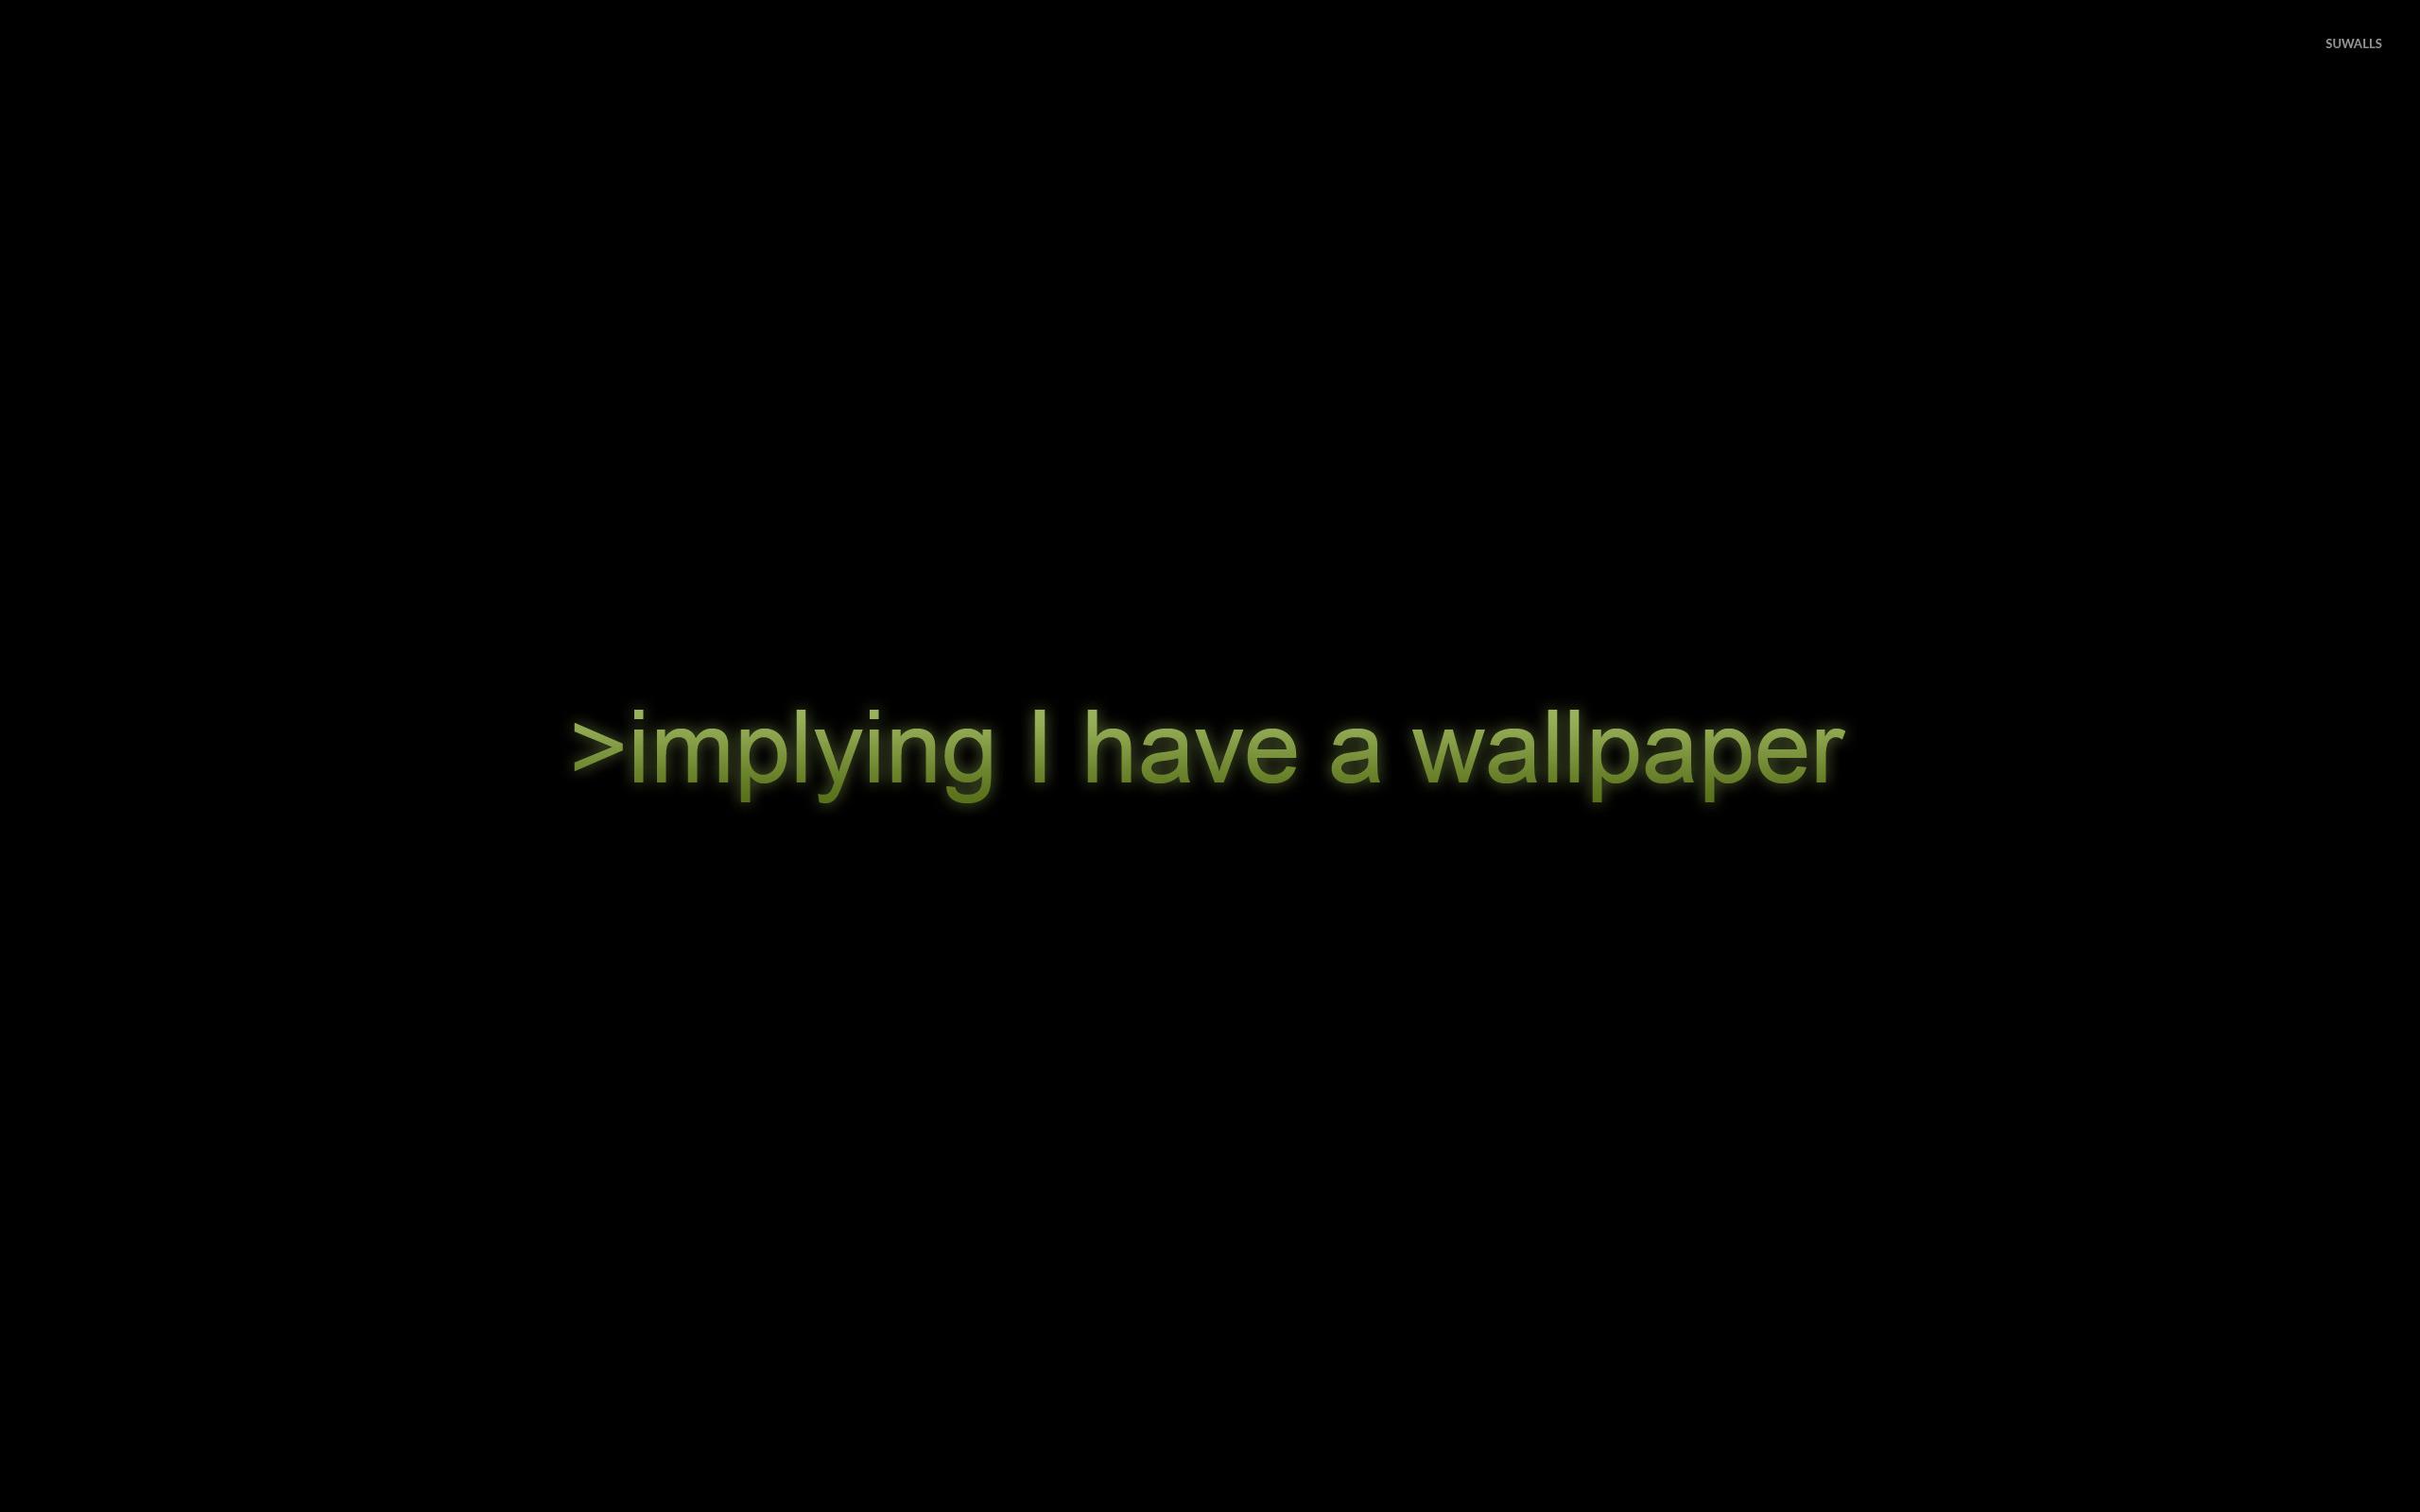 Implying I have a wallpaper wallpaper jpg